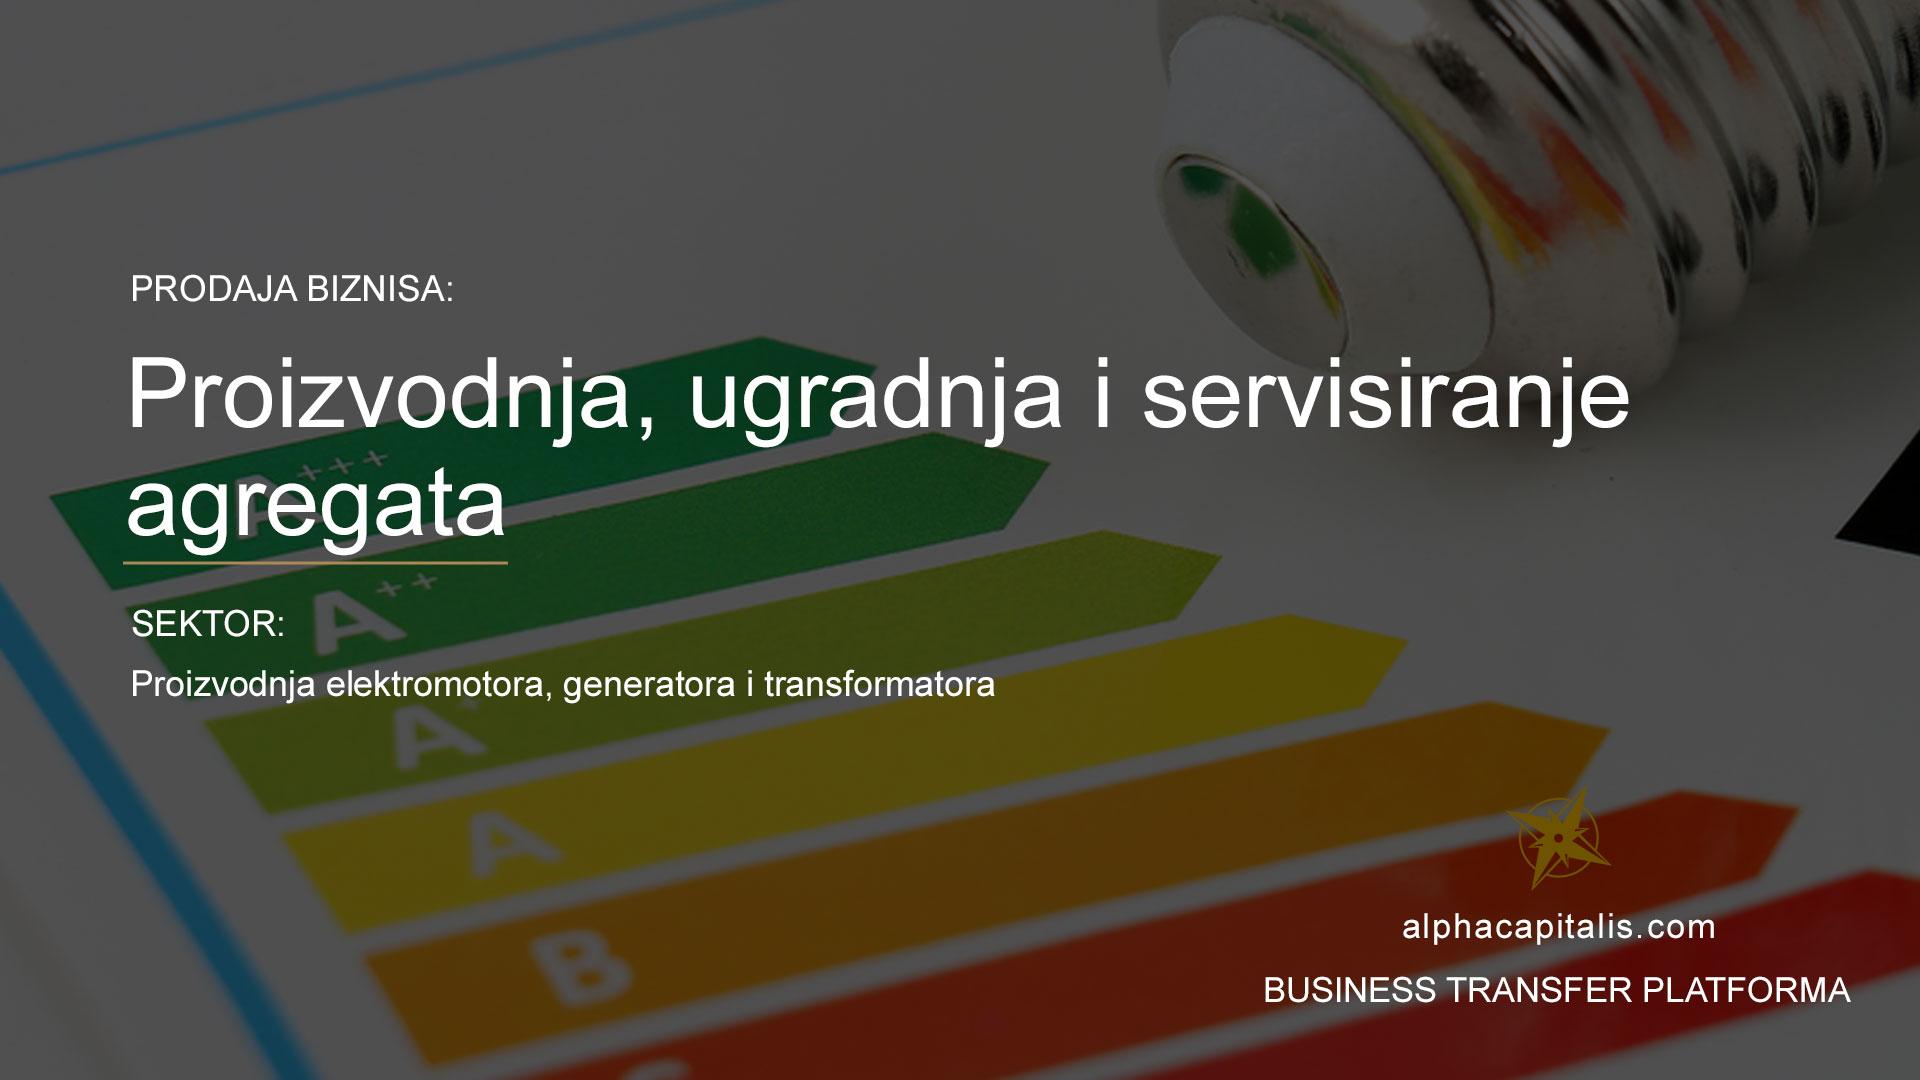 alpha-capitalis-business transfer platforma-prodaja